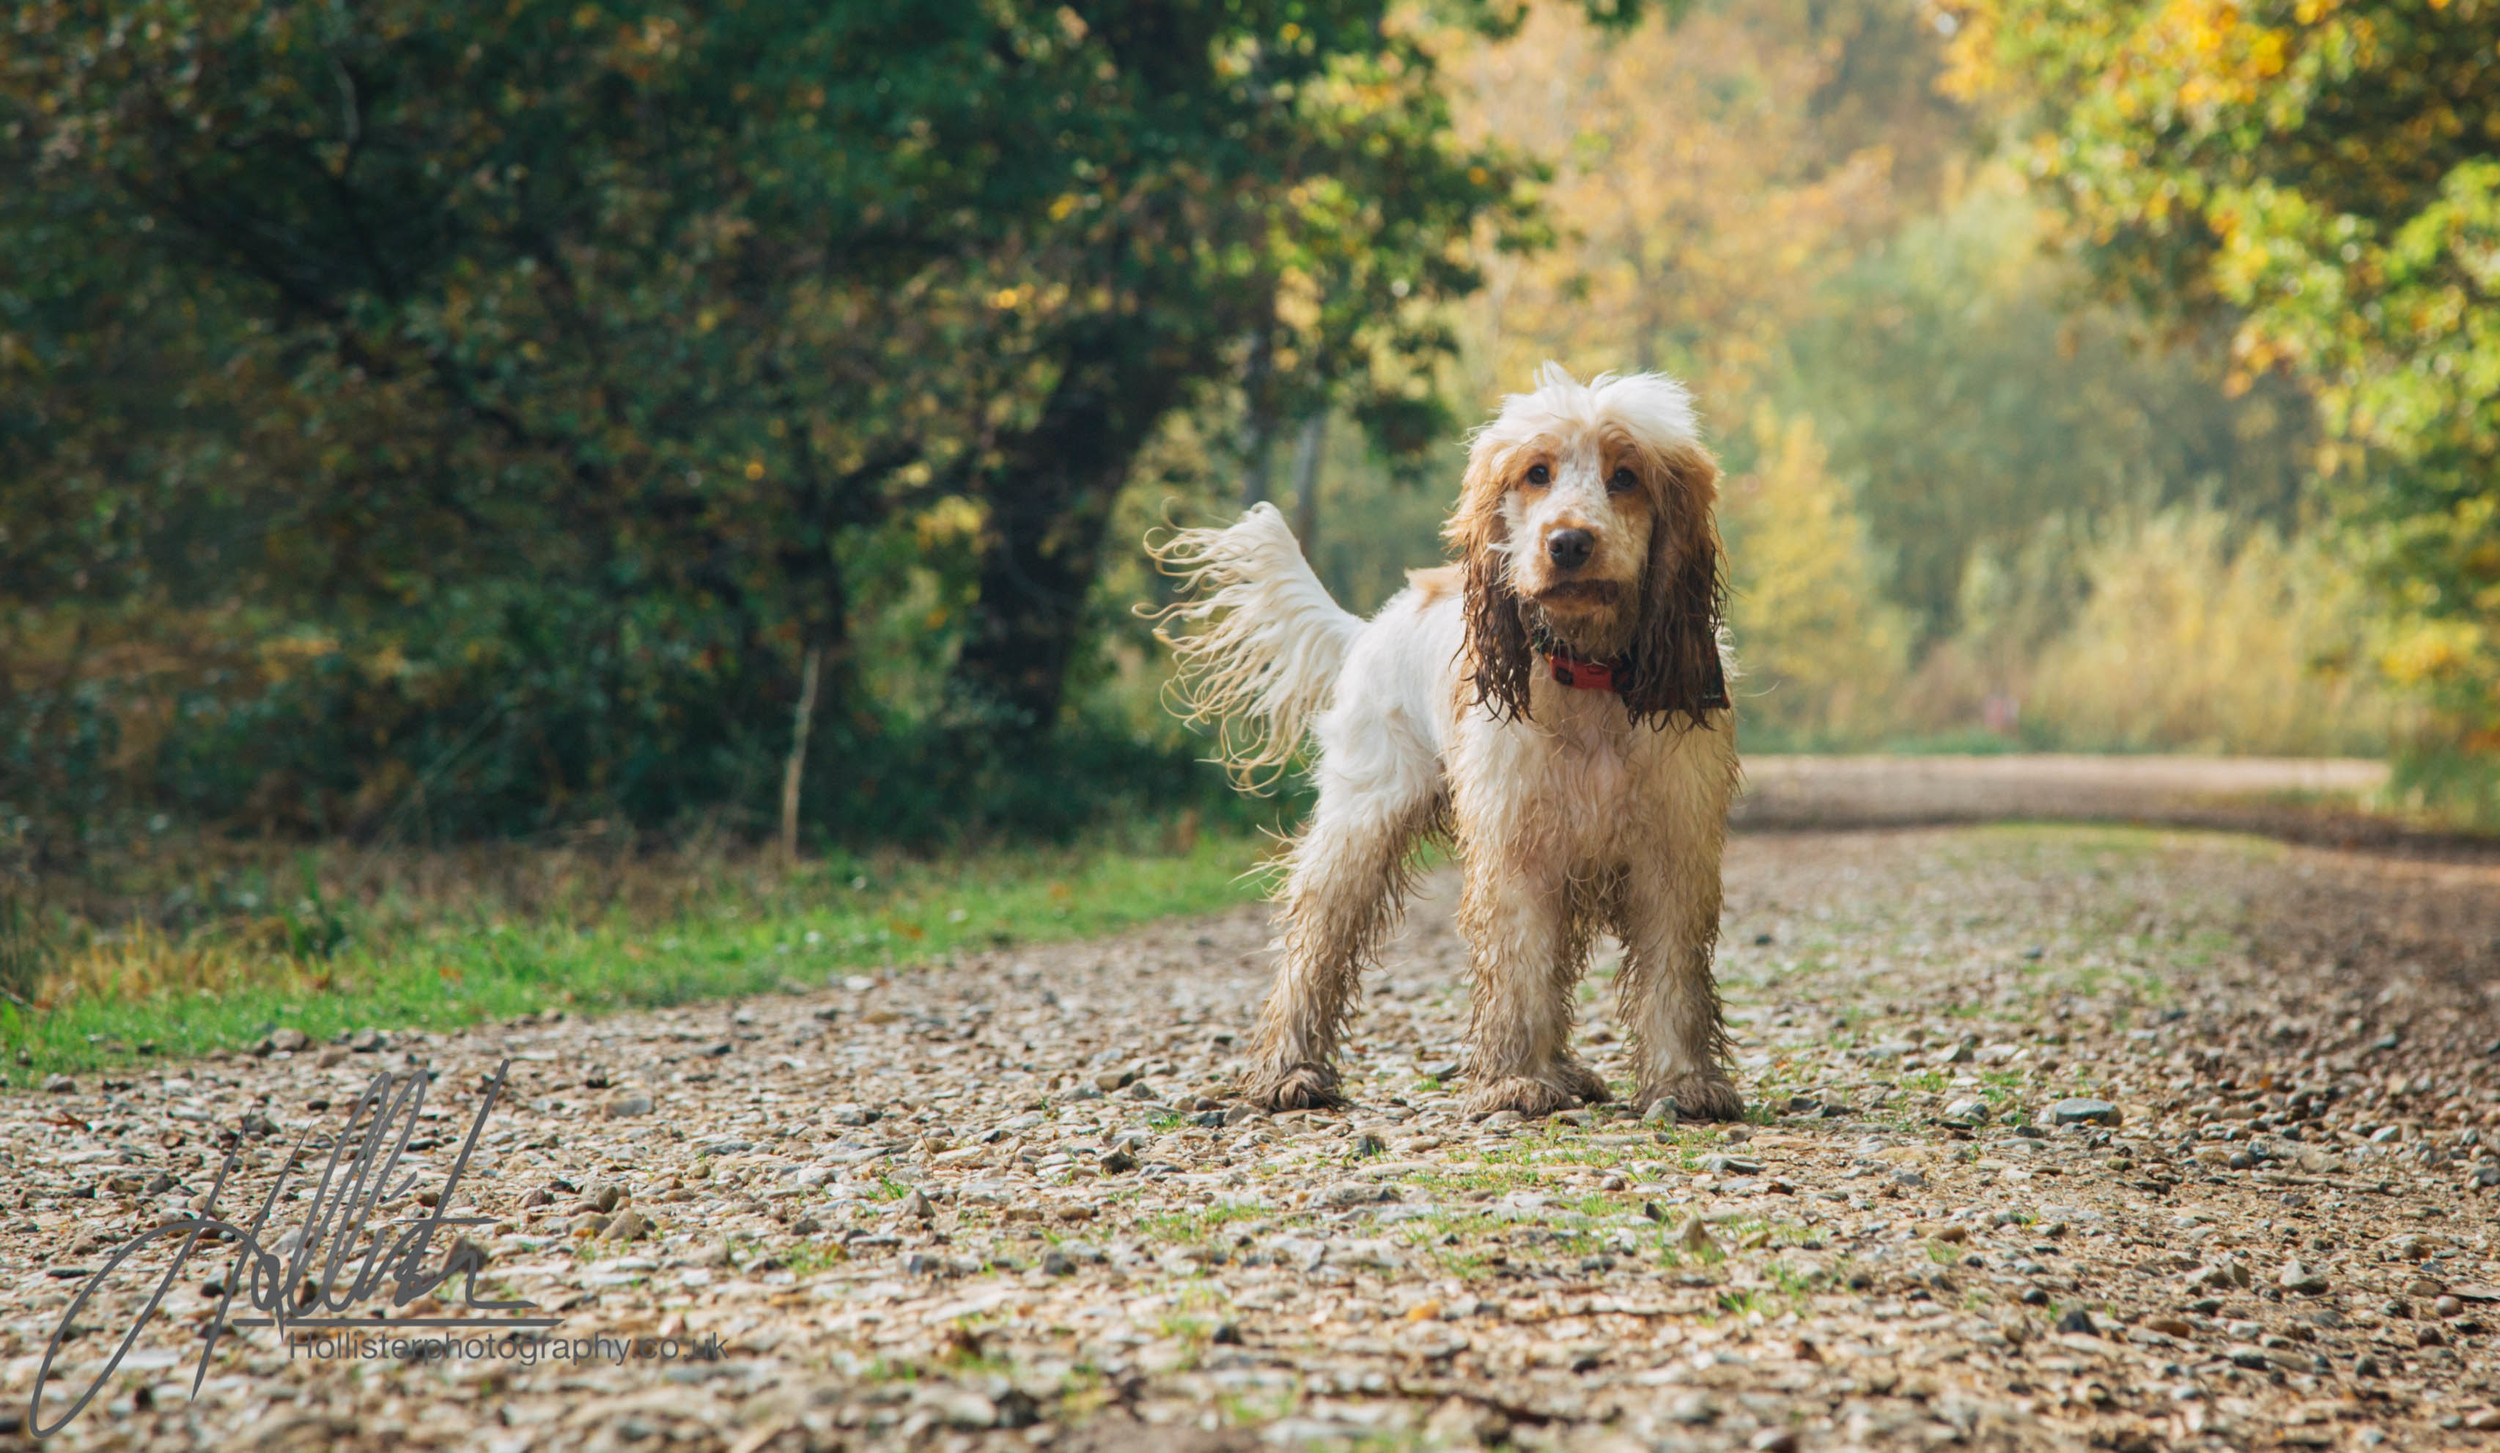 Hollisterphotography ABBY CLOWES WOOD DOG WALK-31.JPG